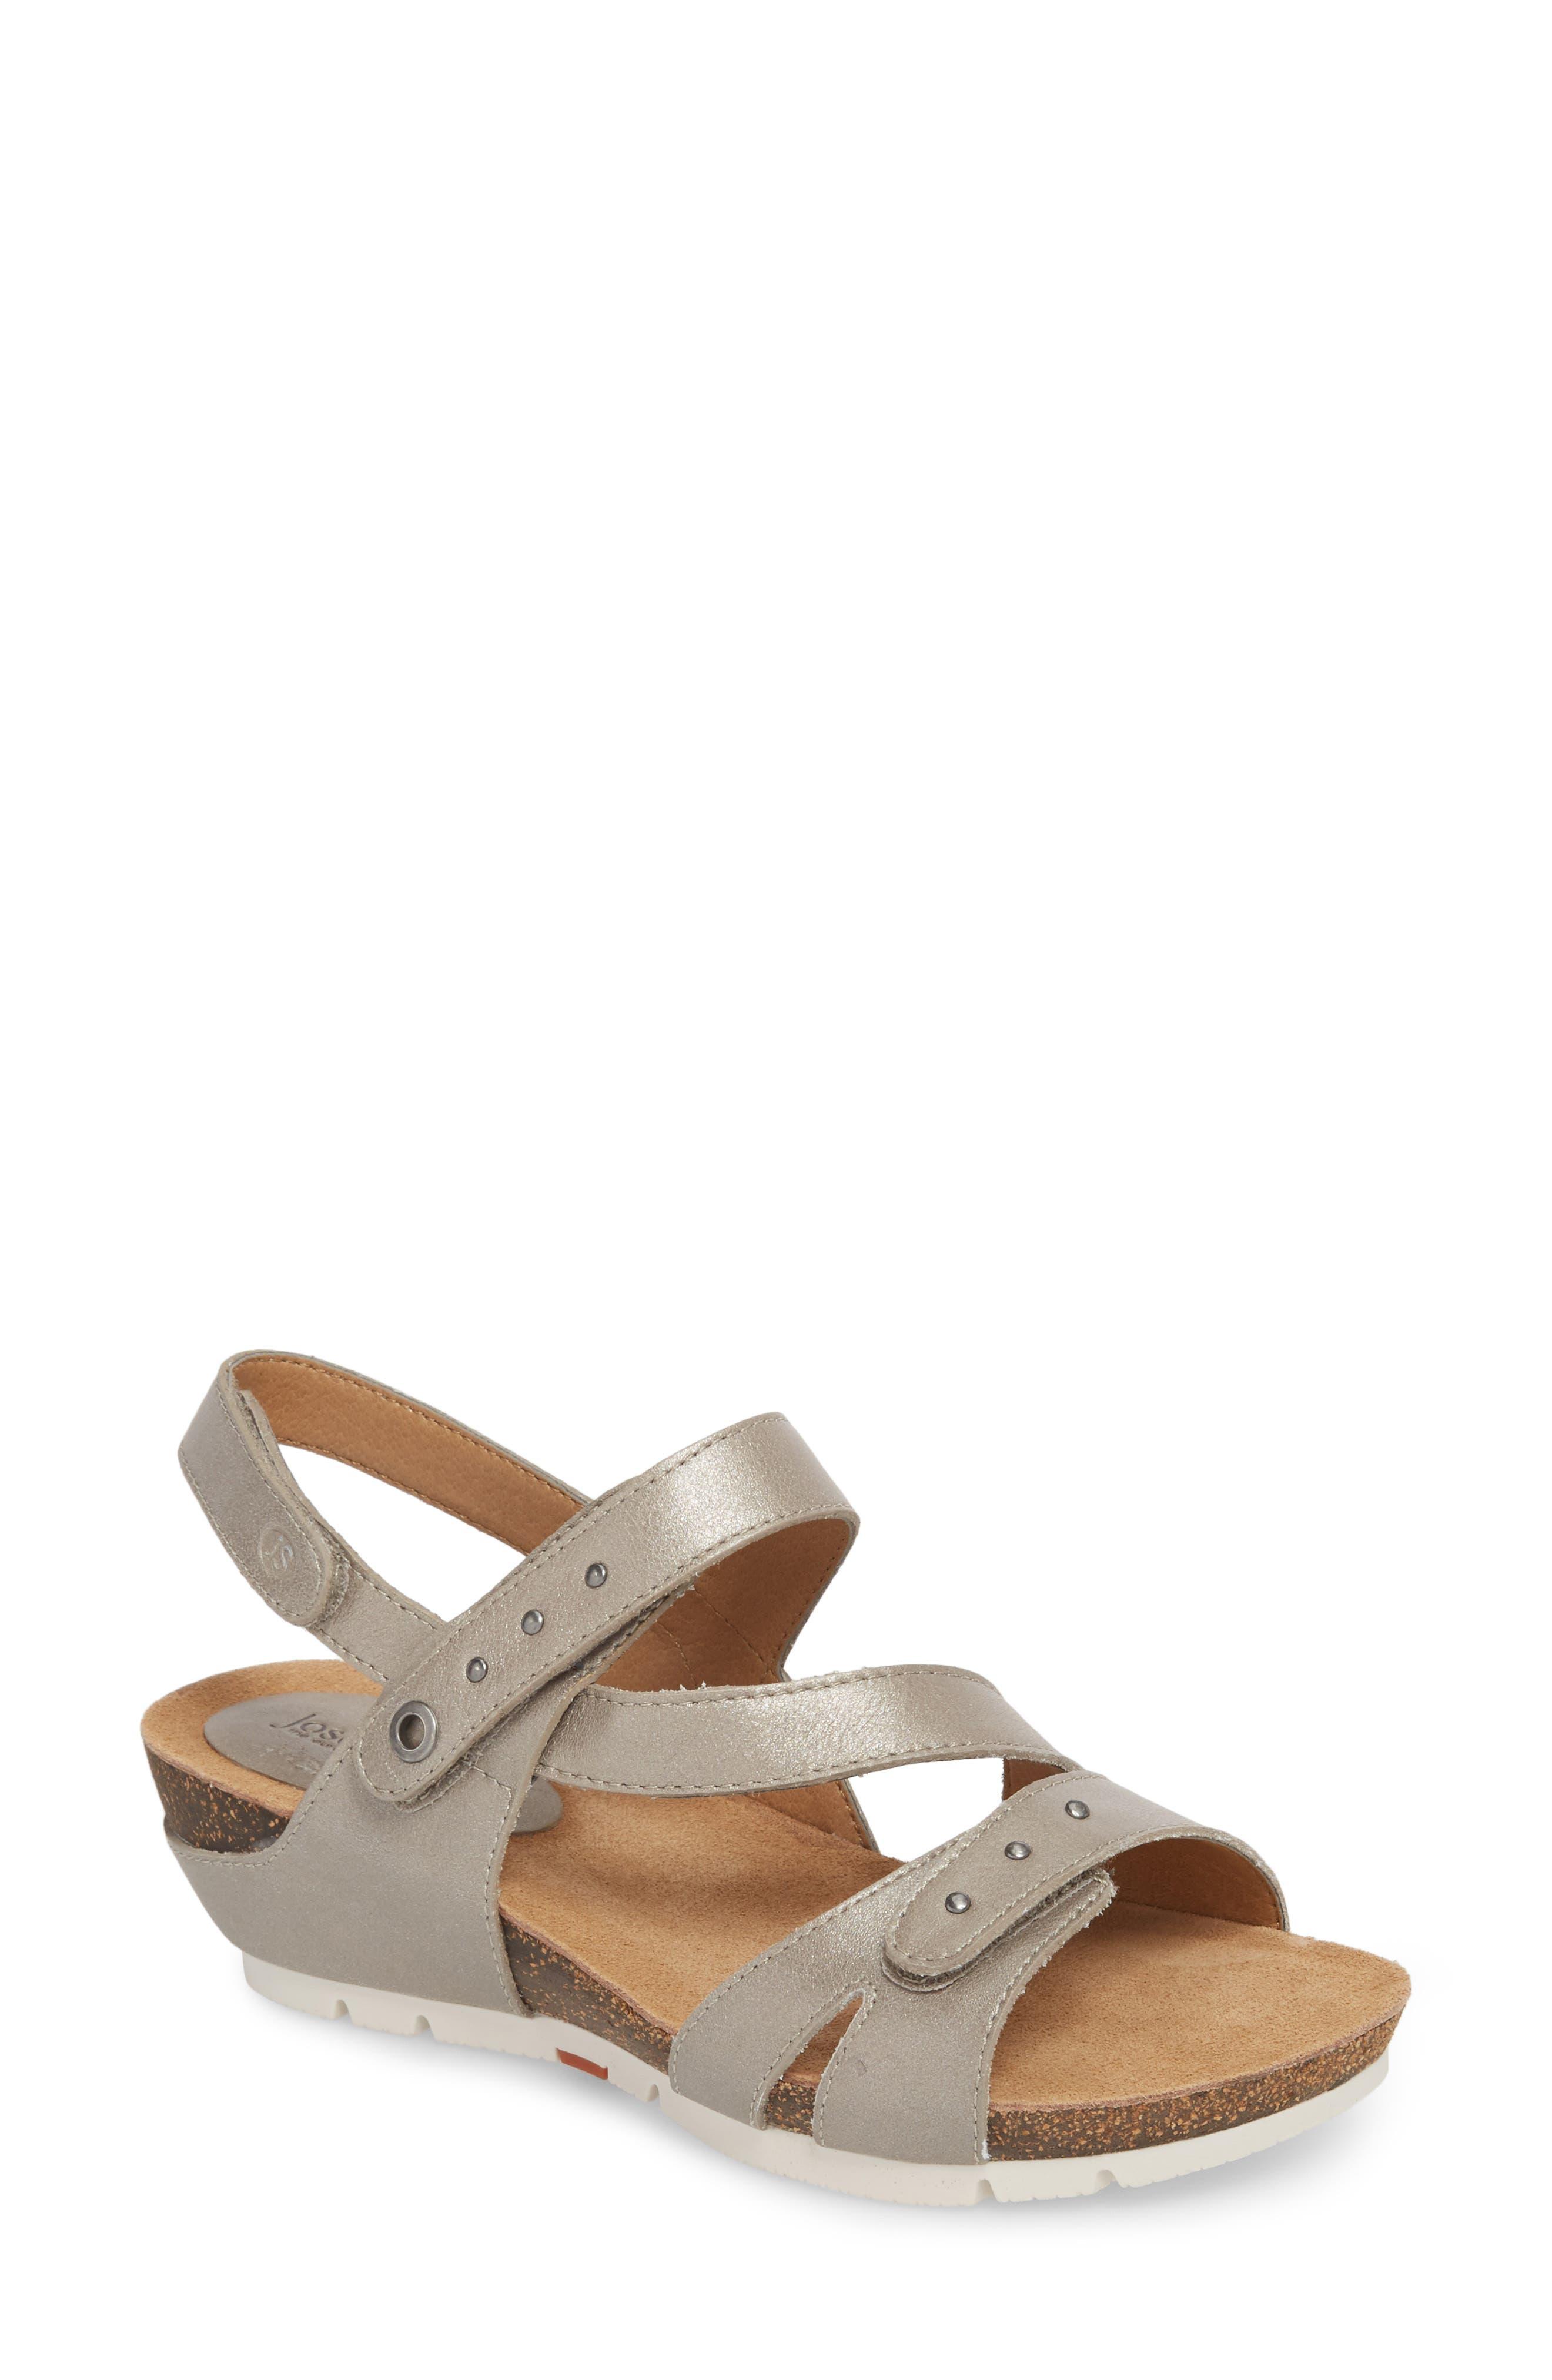 Hailey 33 Sandal,                         Main,                         color, PLATINUM LEATHER